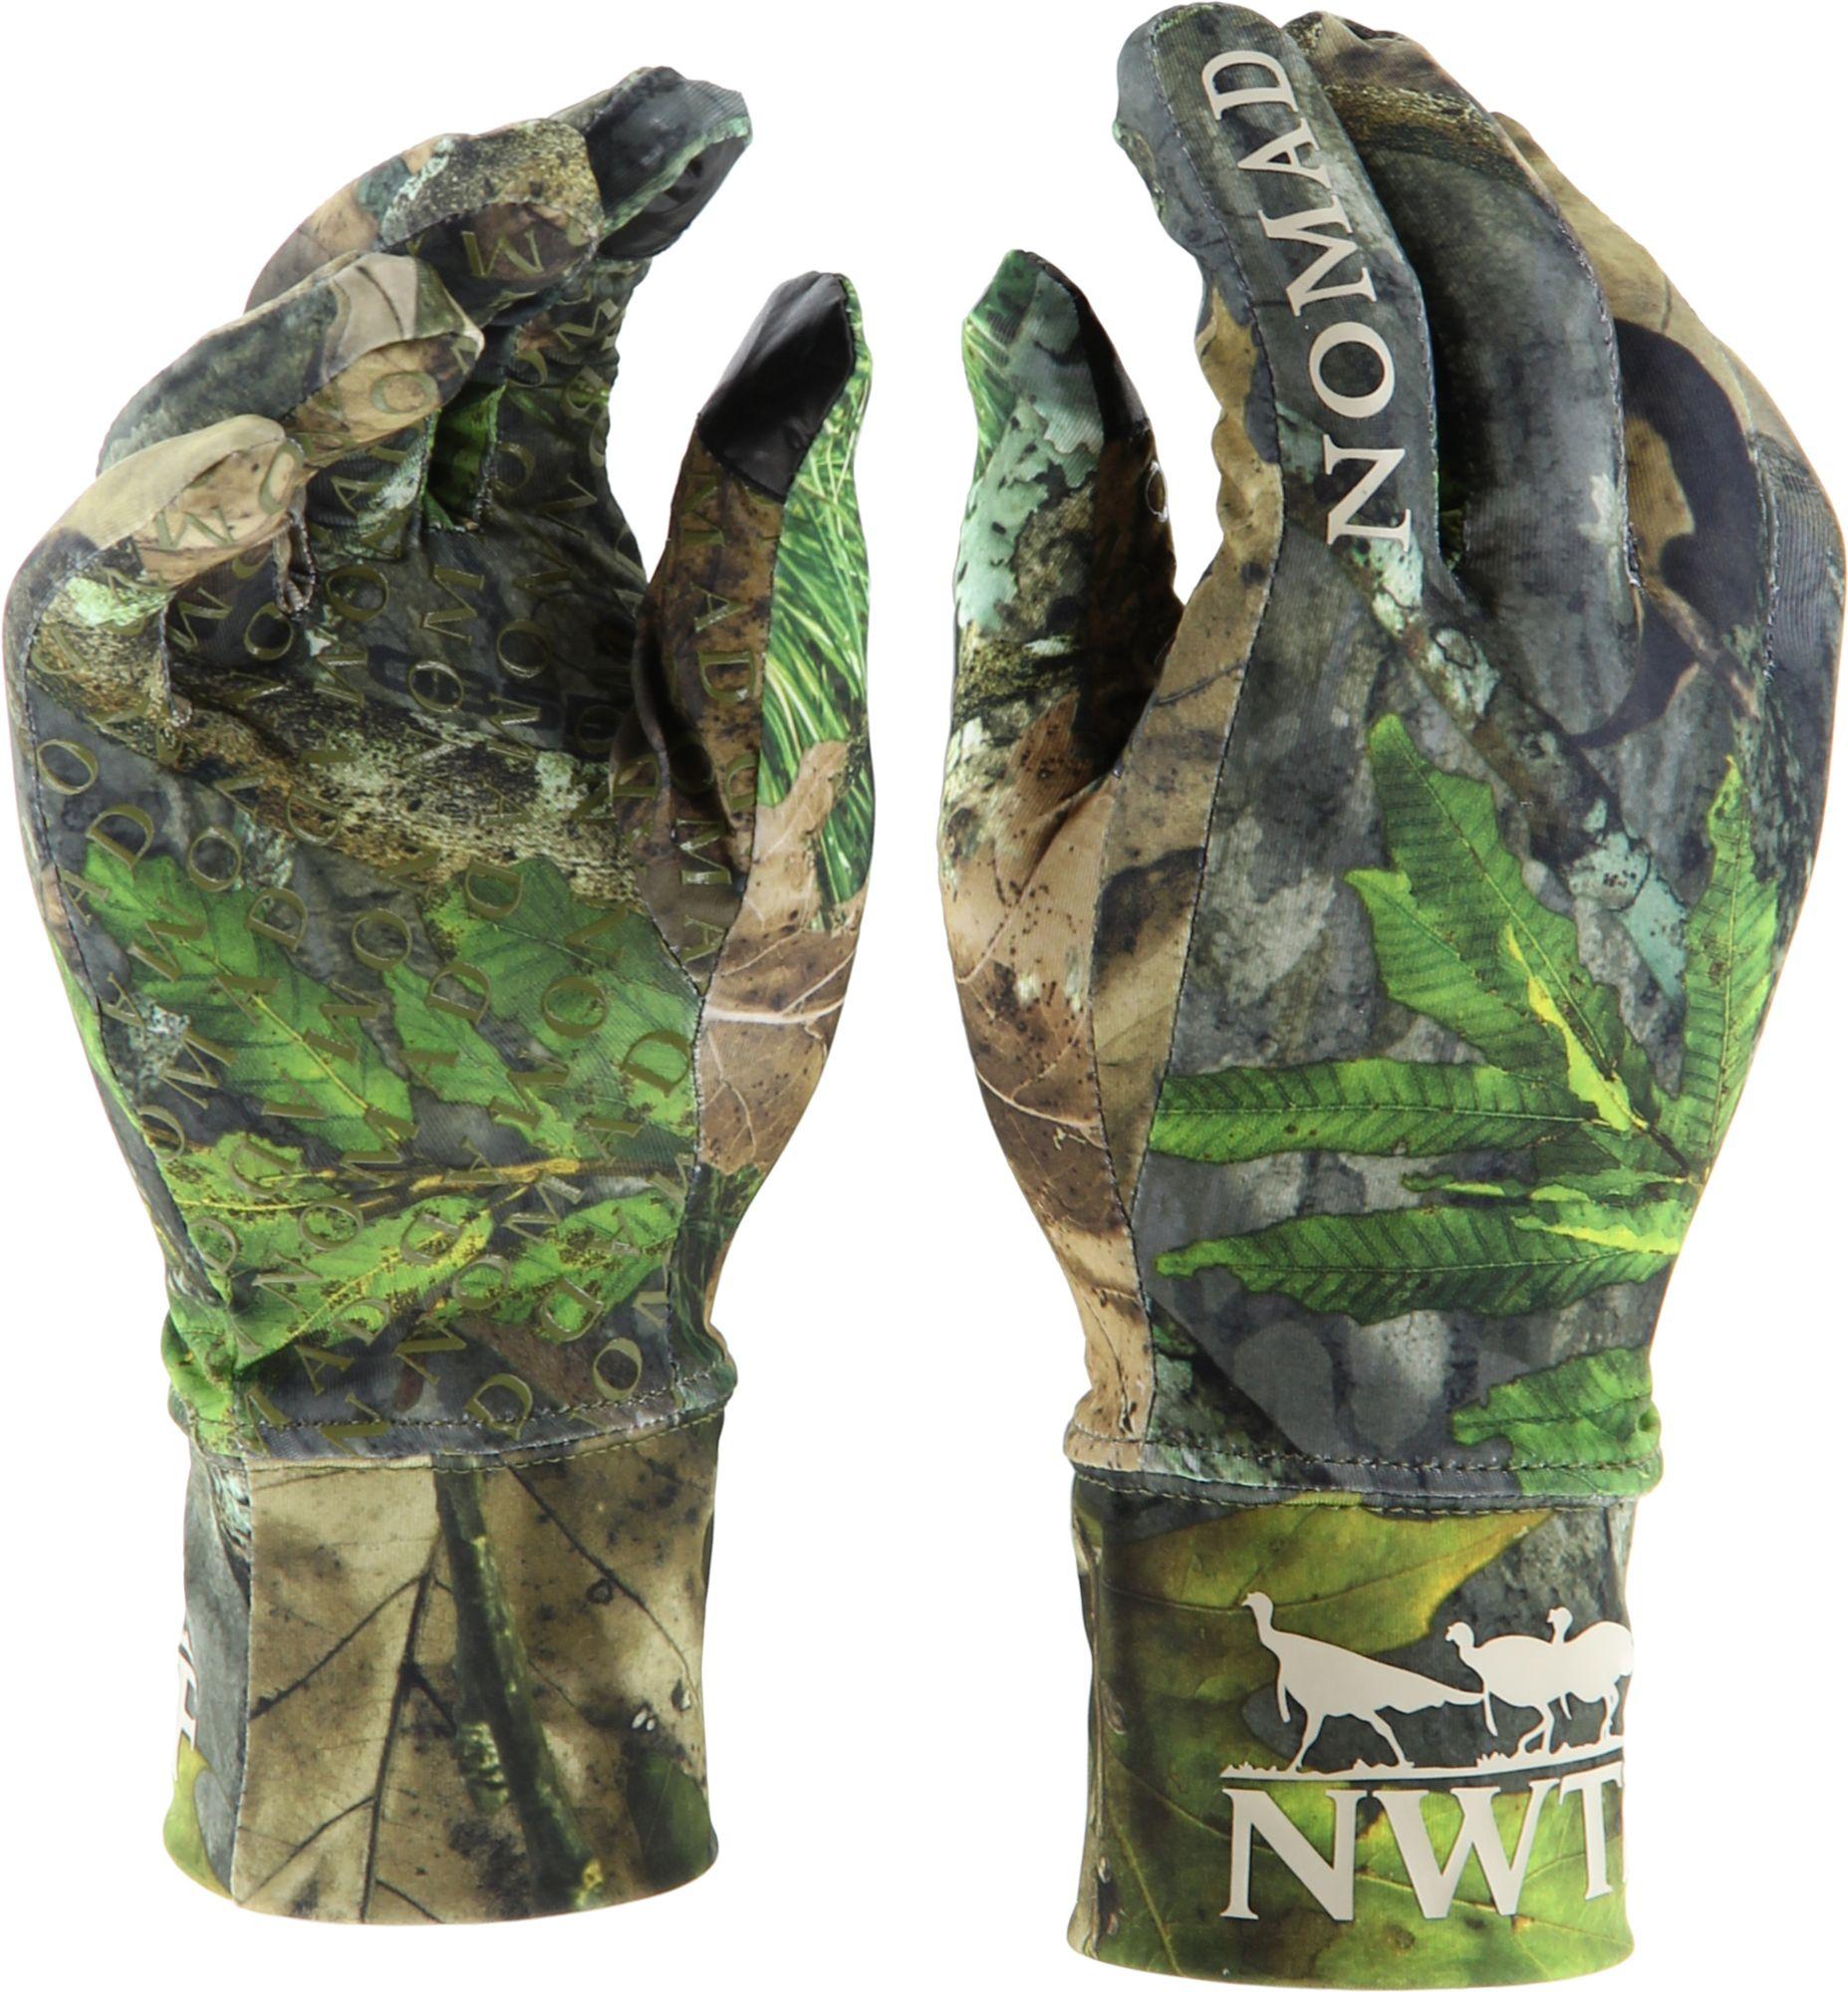 NOMAD Men's NWTF Turkey Hunting Gloves, Size: Medium/Large, Mossy Oak Obsession Nwtf thumbnail